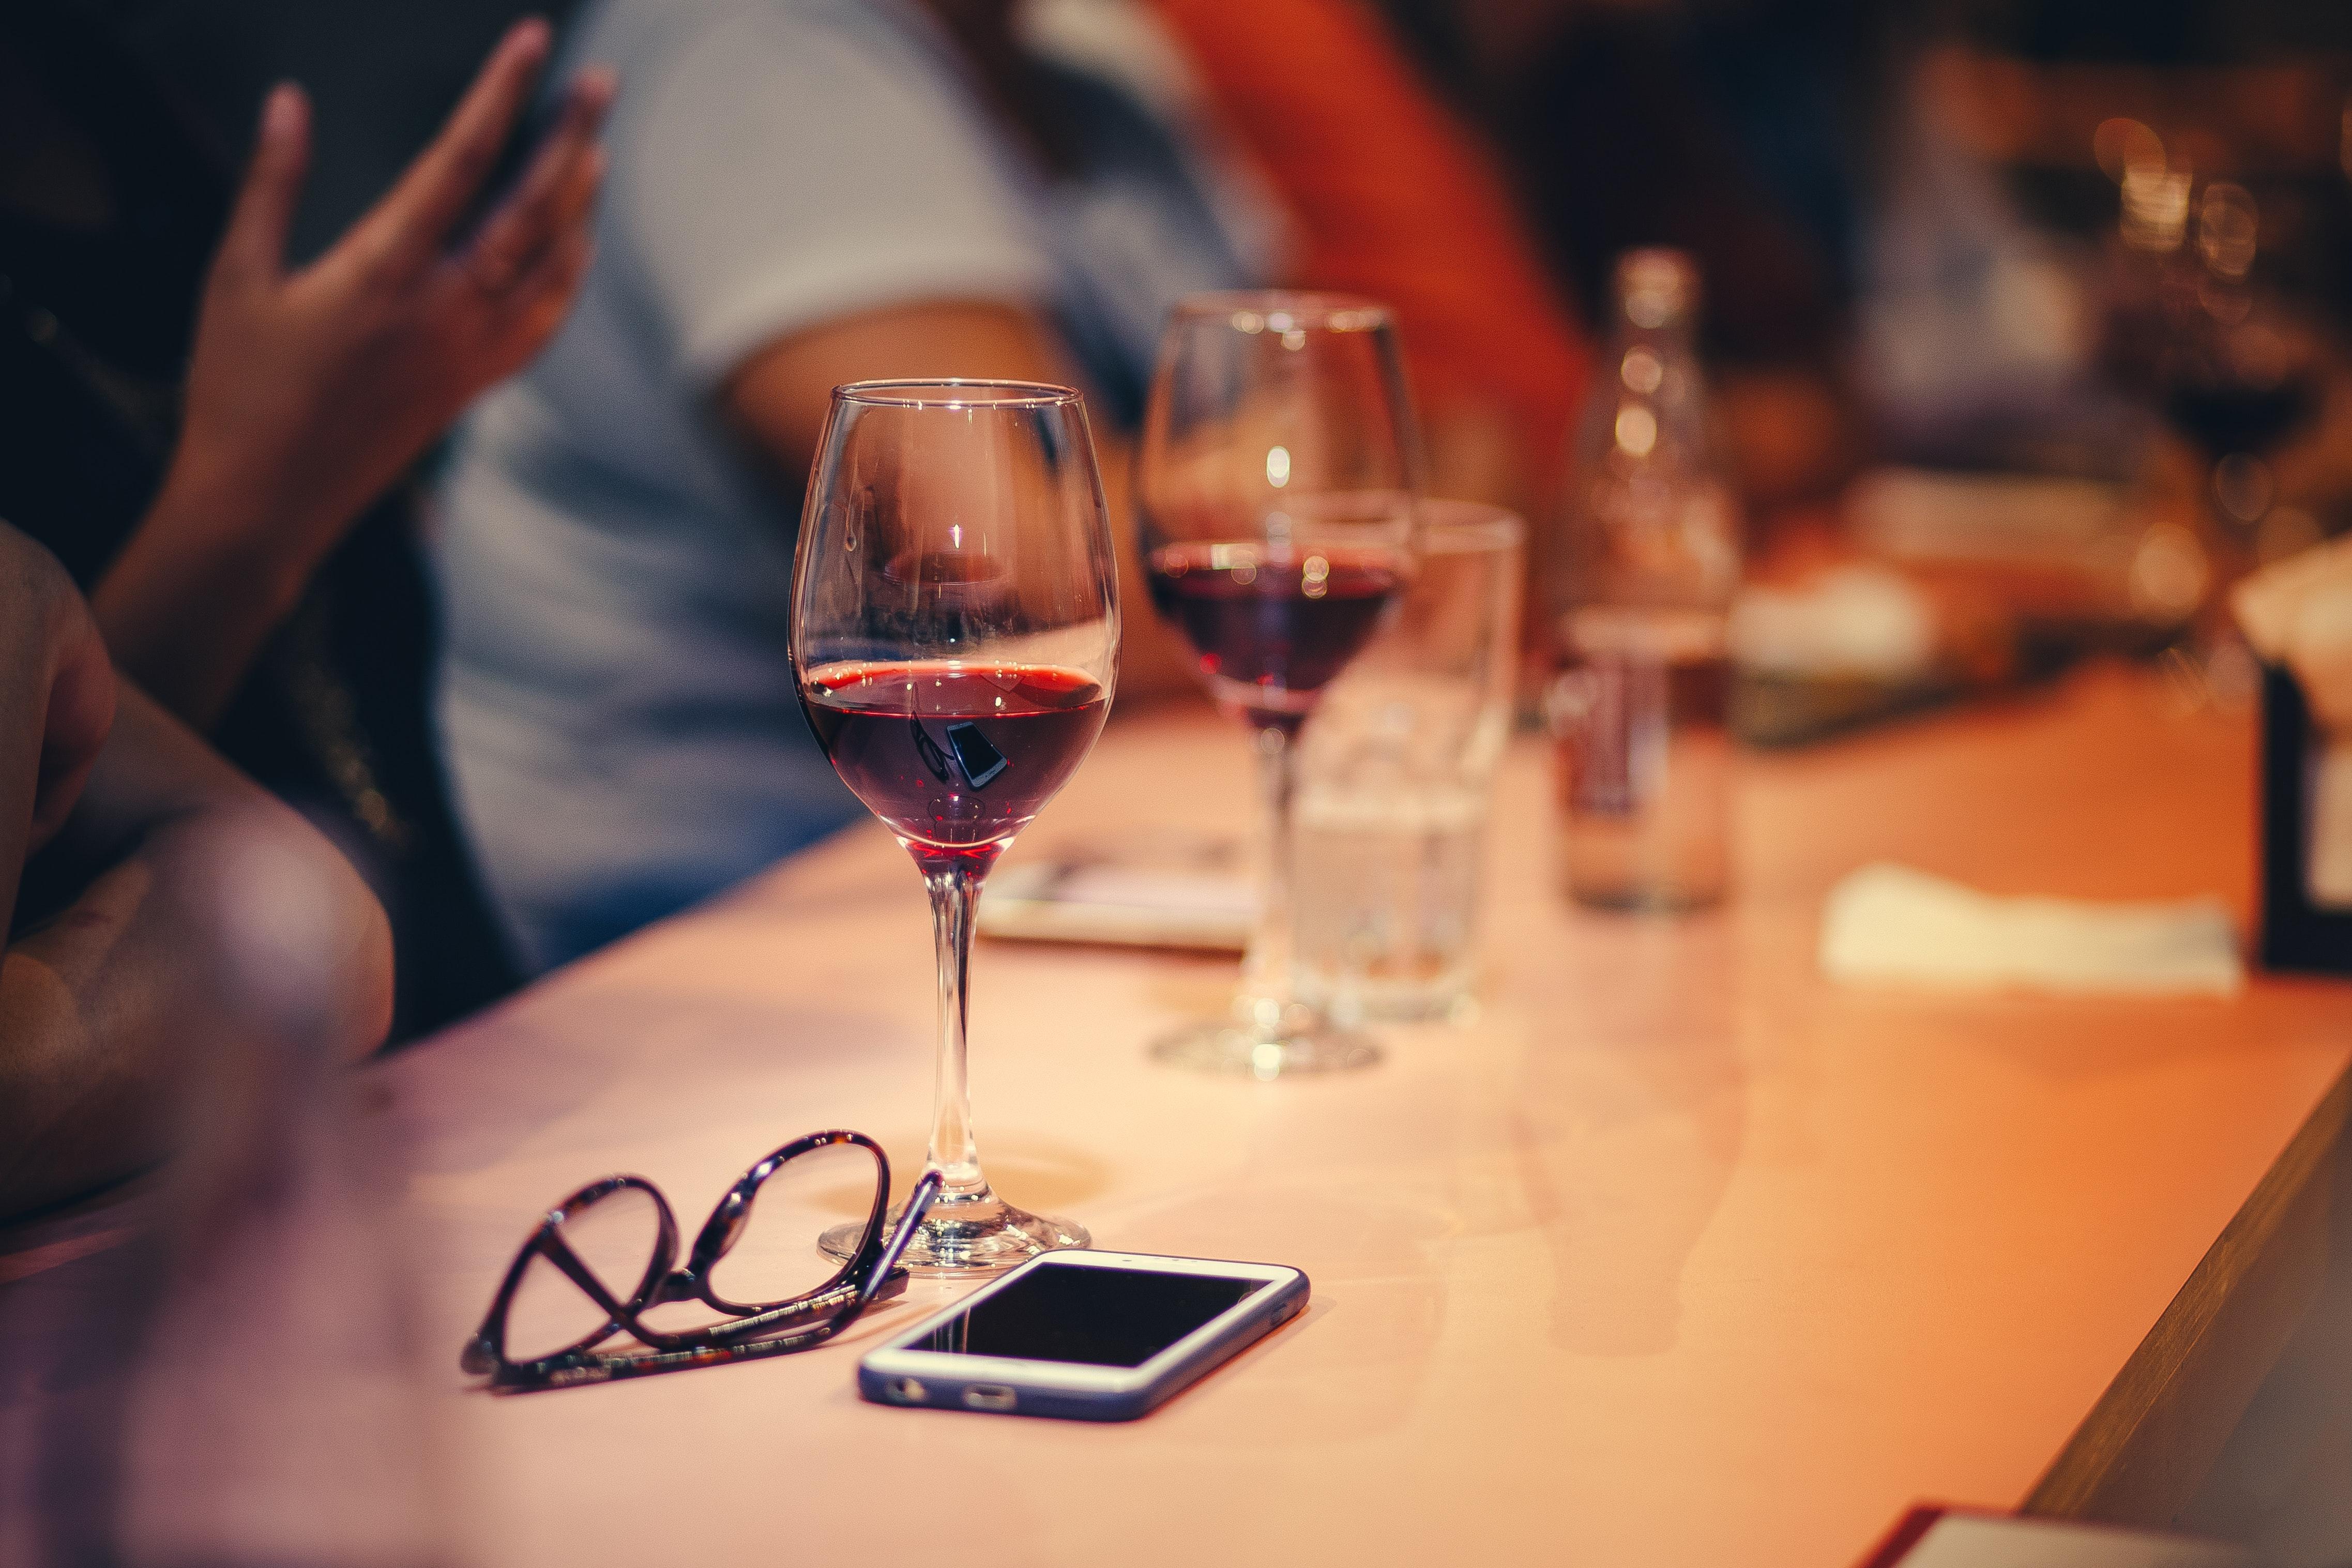 Wine glasses on table photo